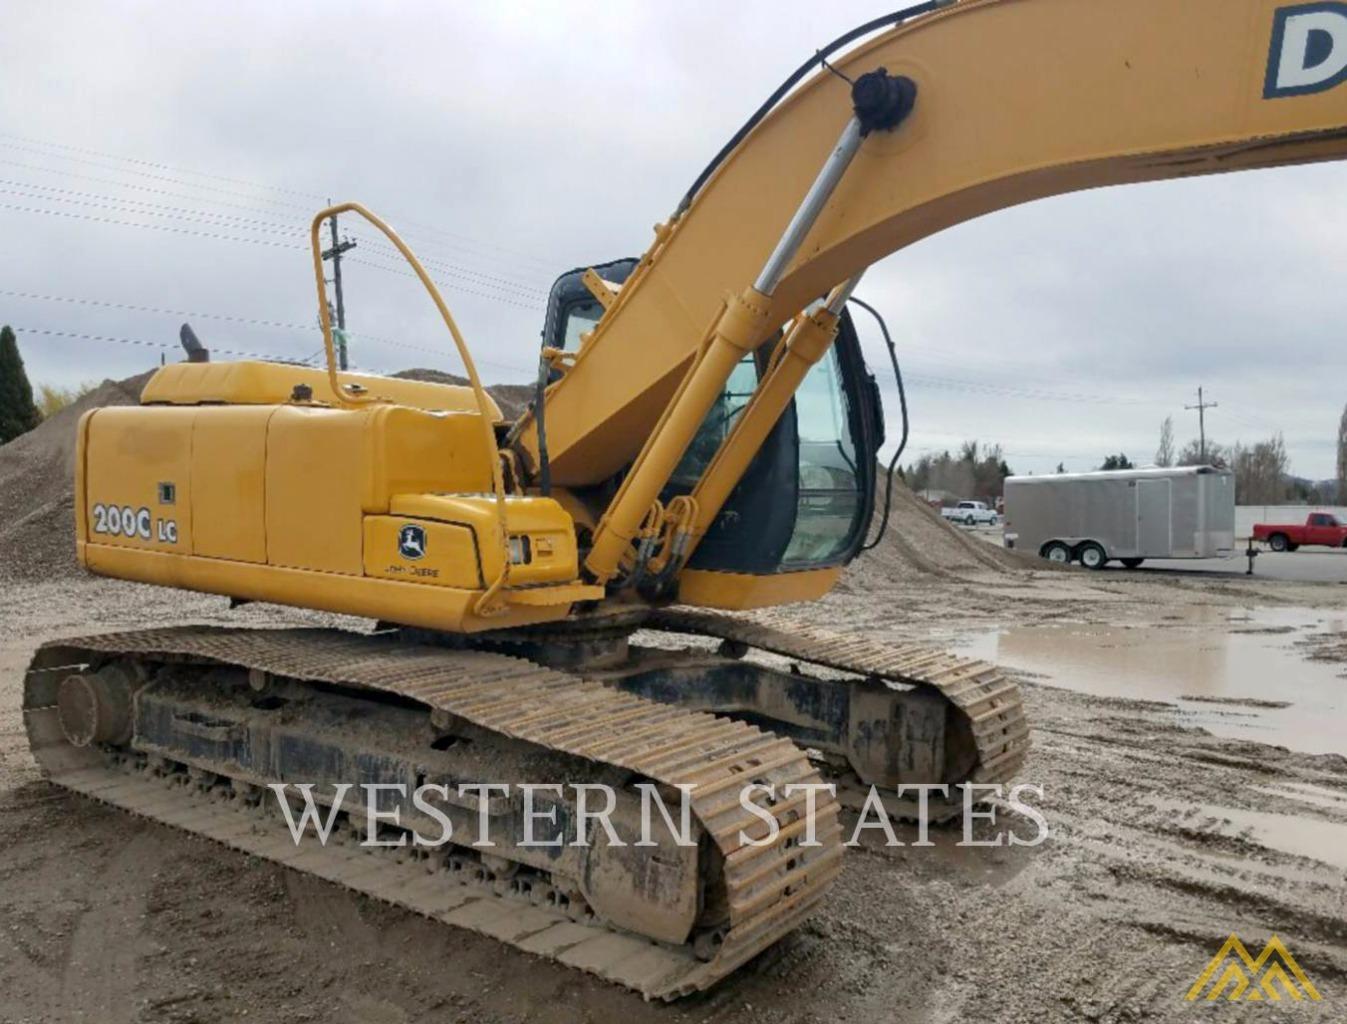 Deere 200C LC crawler excavator with 24